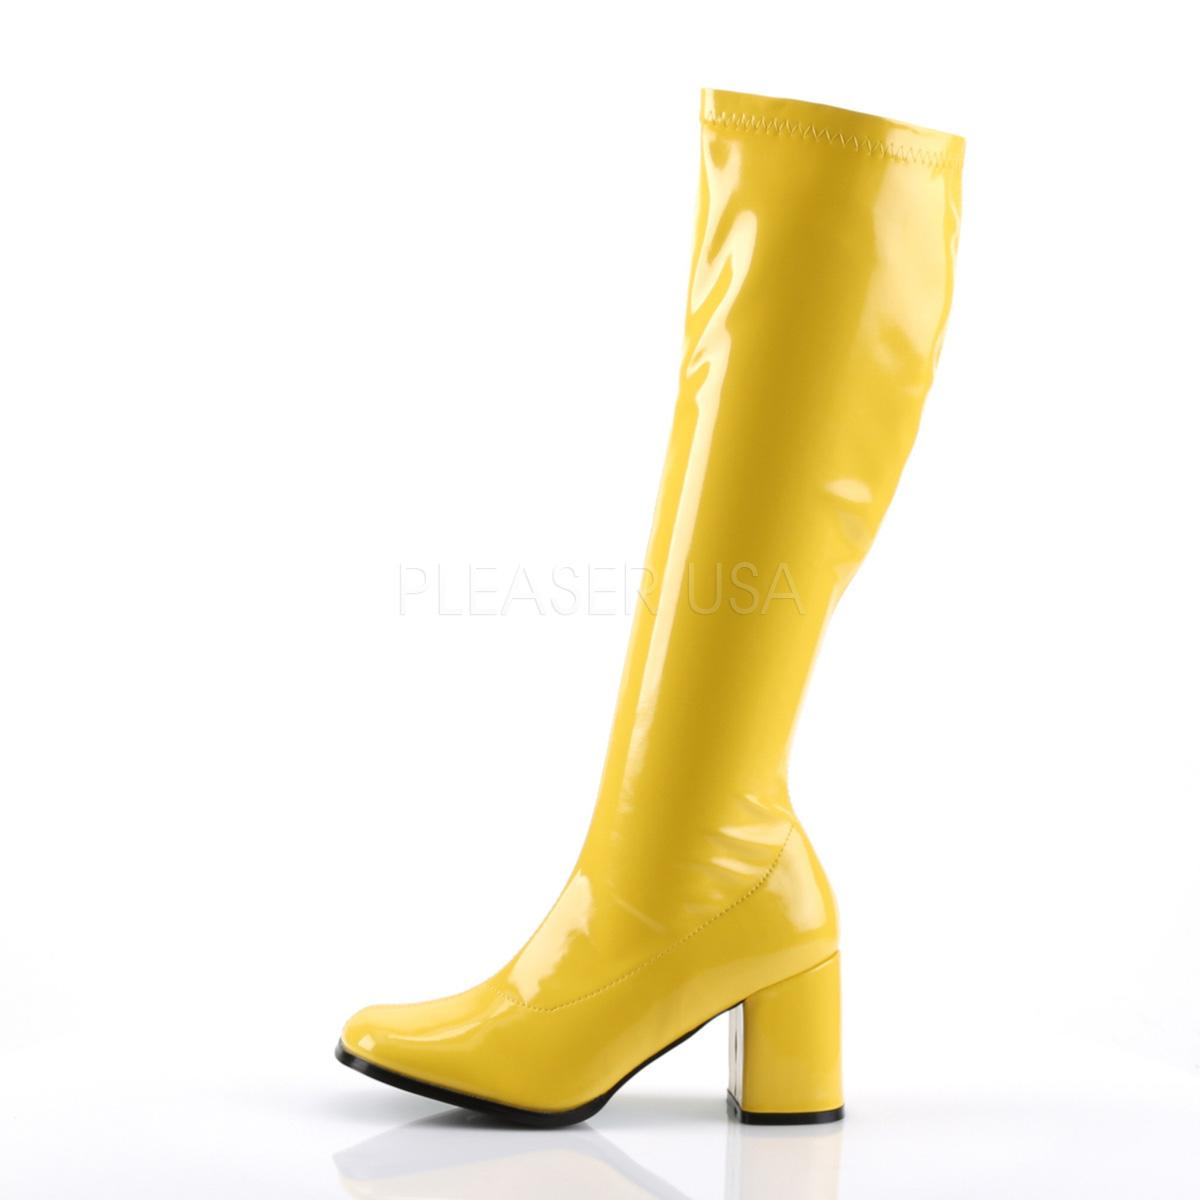 FUNTASMA(Pleaser) GOGO-300 イエロー 黄色 ニーハイブーツ GOGOブーツ コスプレ用ブーツ イベント 衣装 仮装 ハロウィン◆取り寄せ